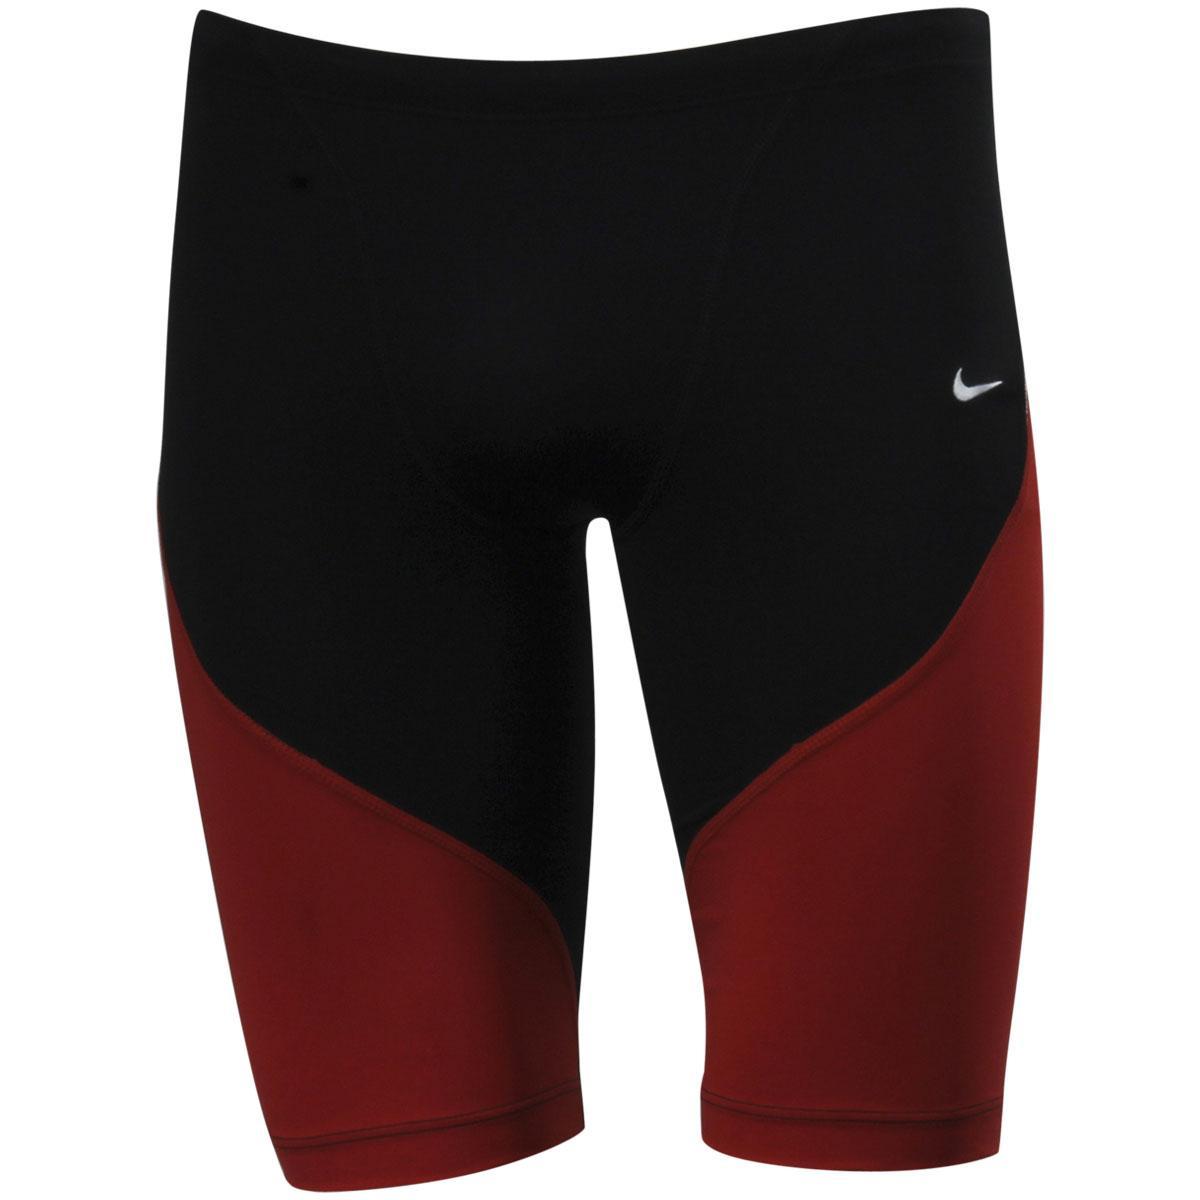 Nike Men's Poly Color Surge Jammer Performance Swimwear